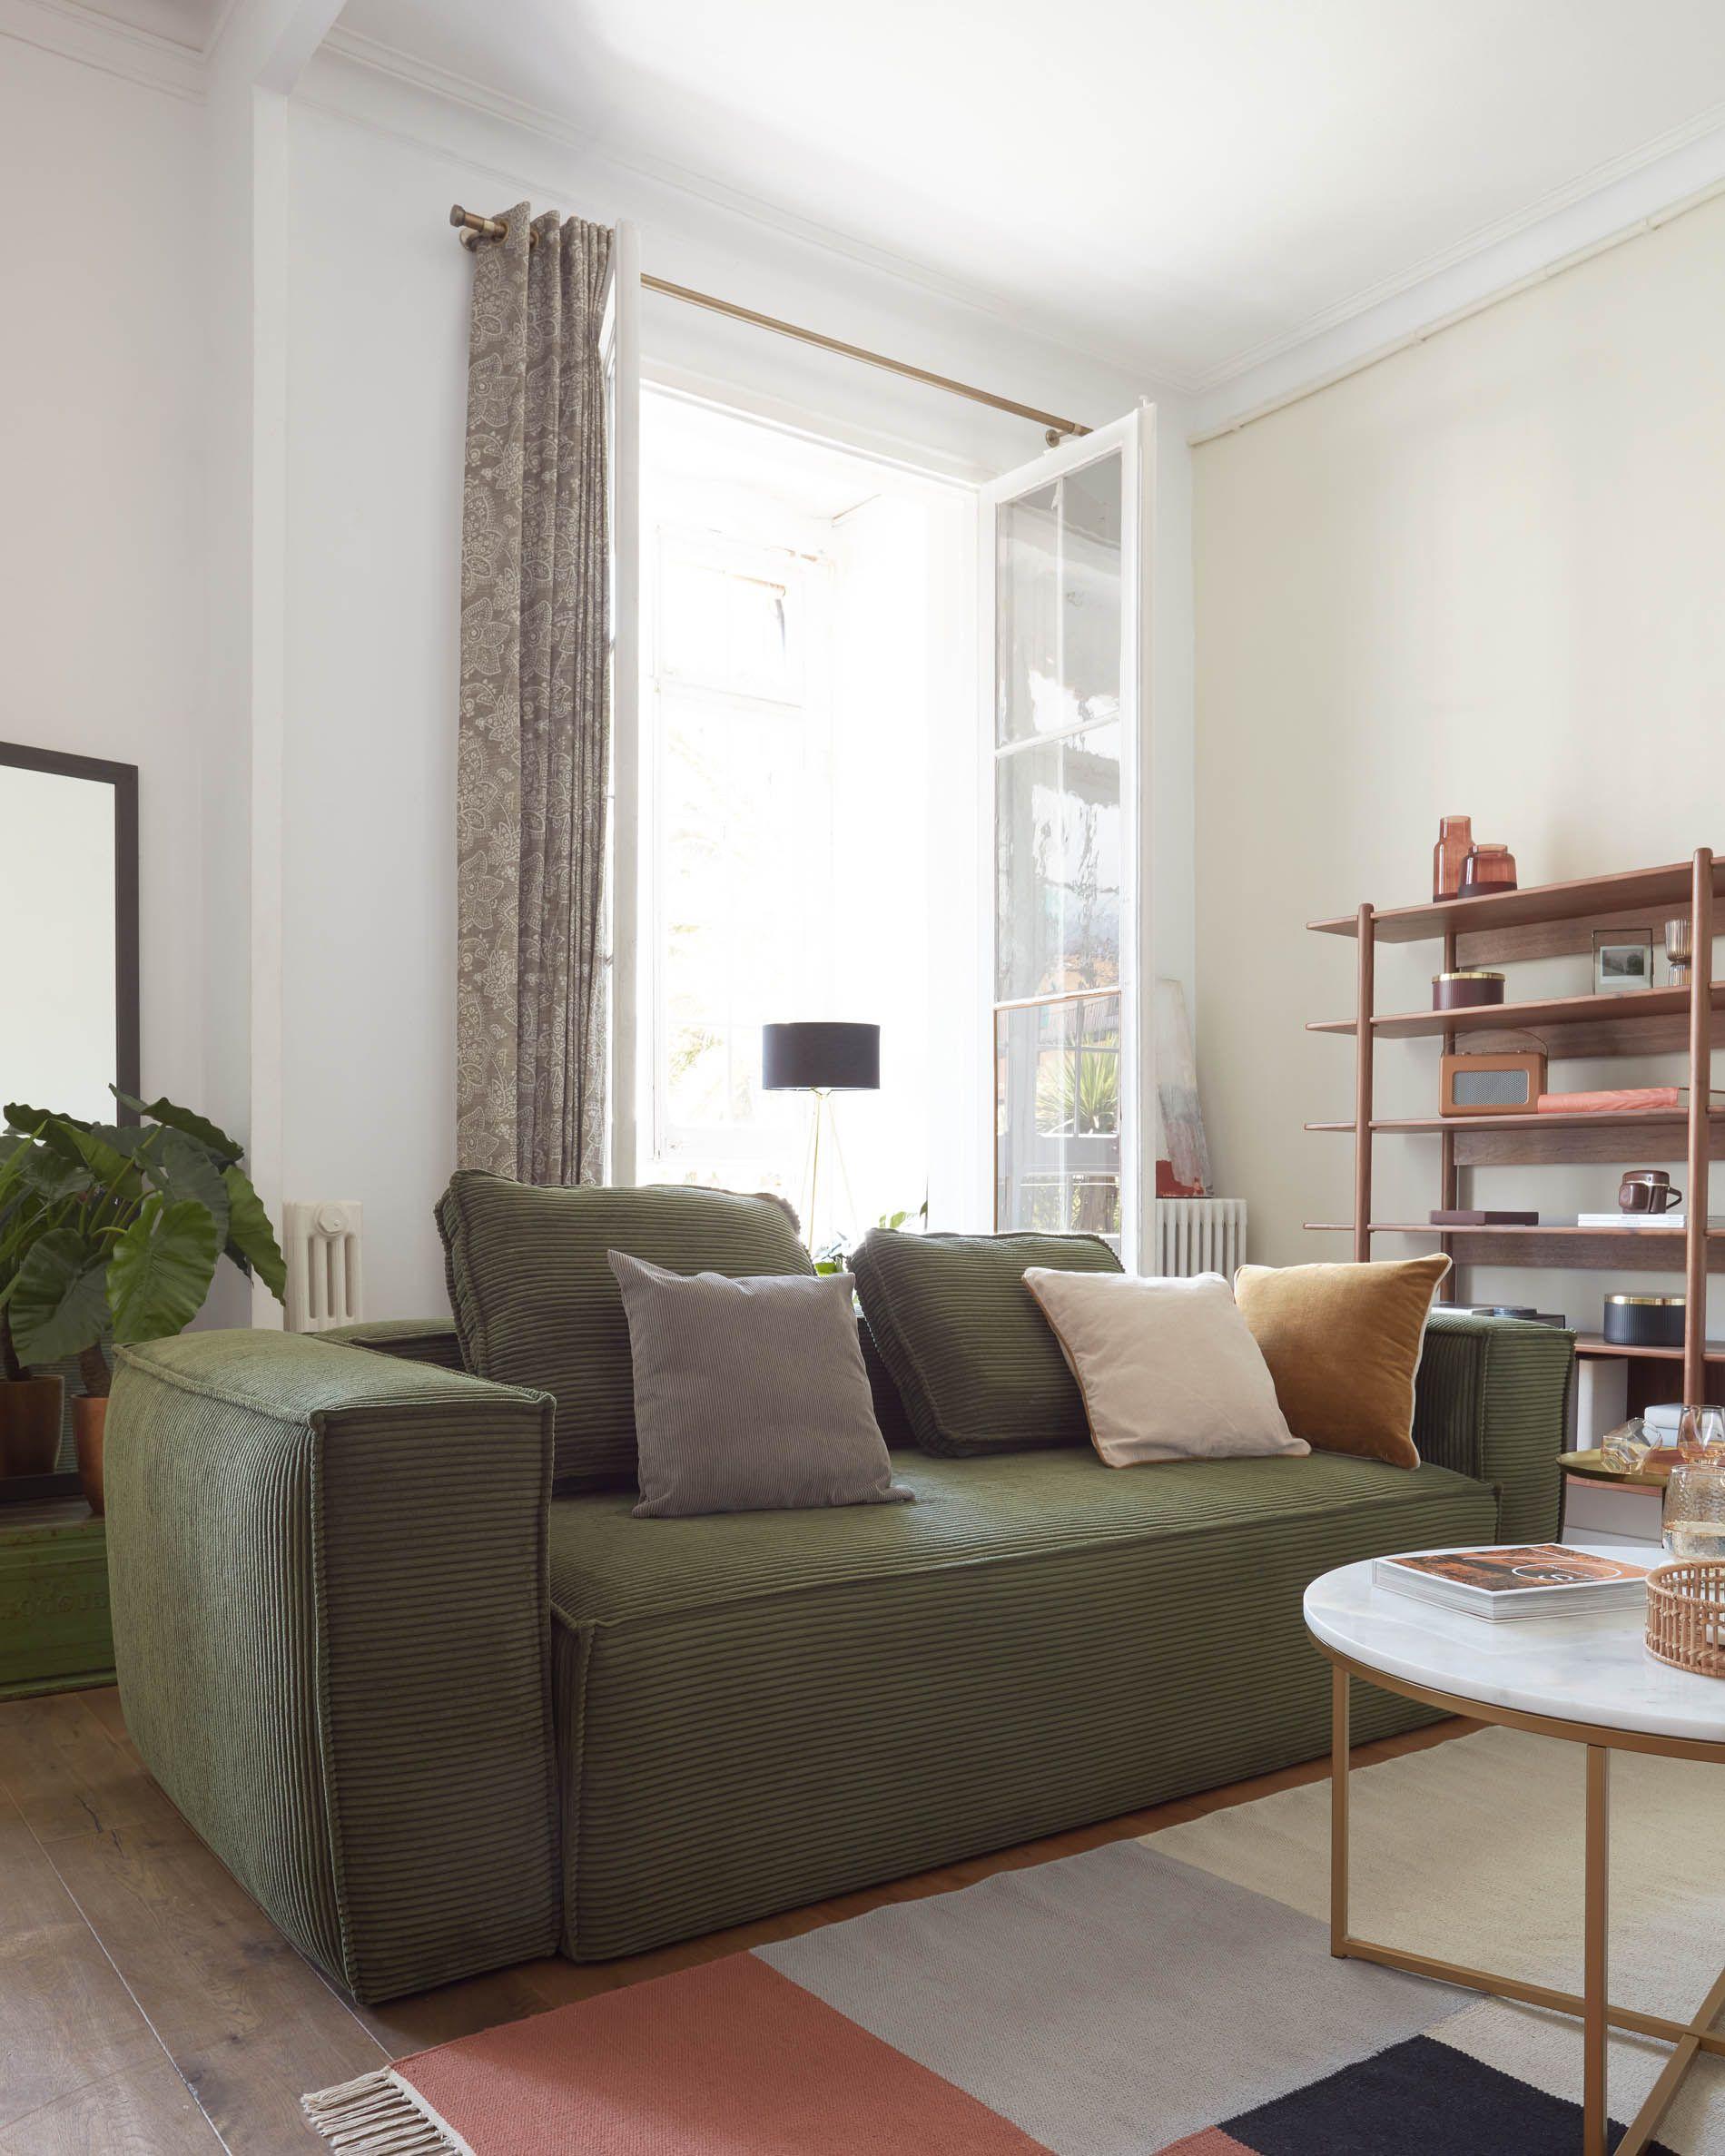 Sofá blok en pana verde